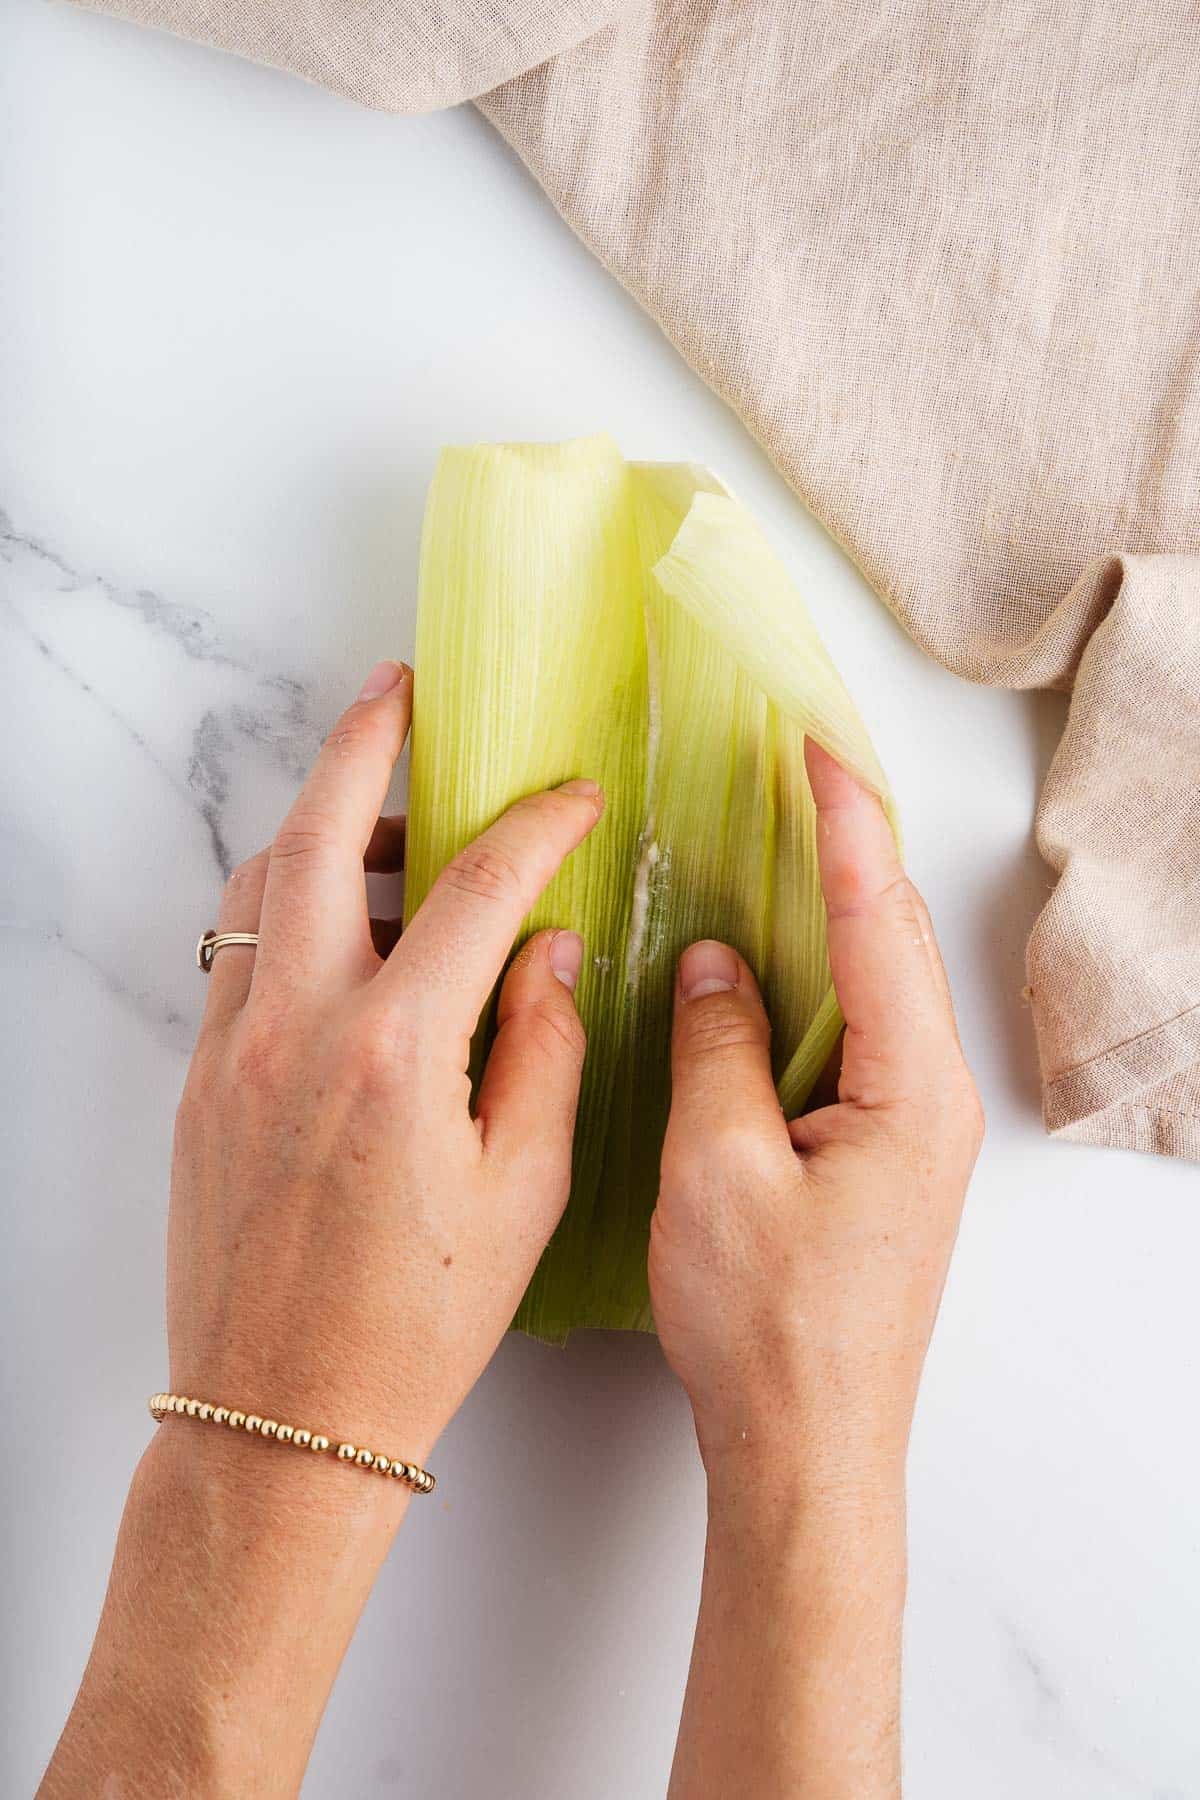 Hands Folding a Tamal de Elote